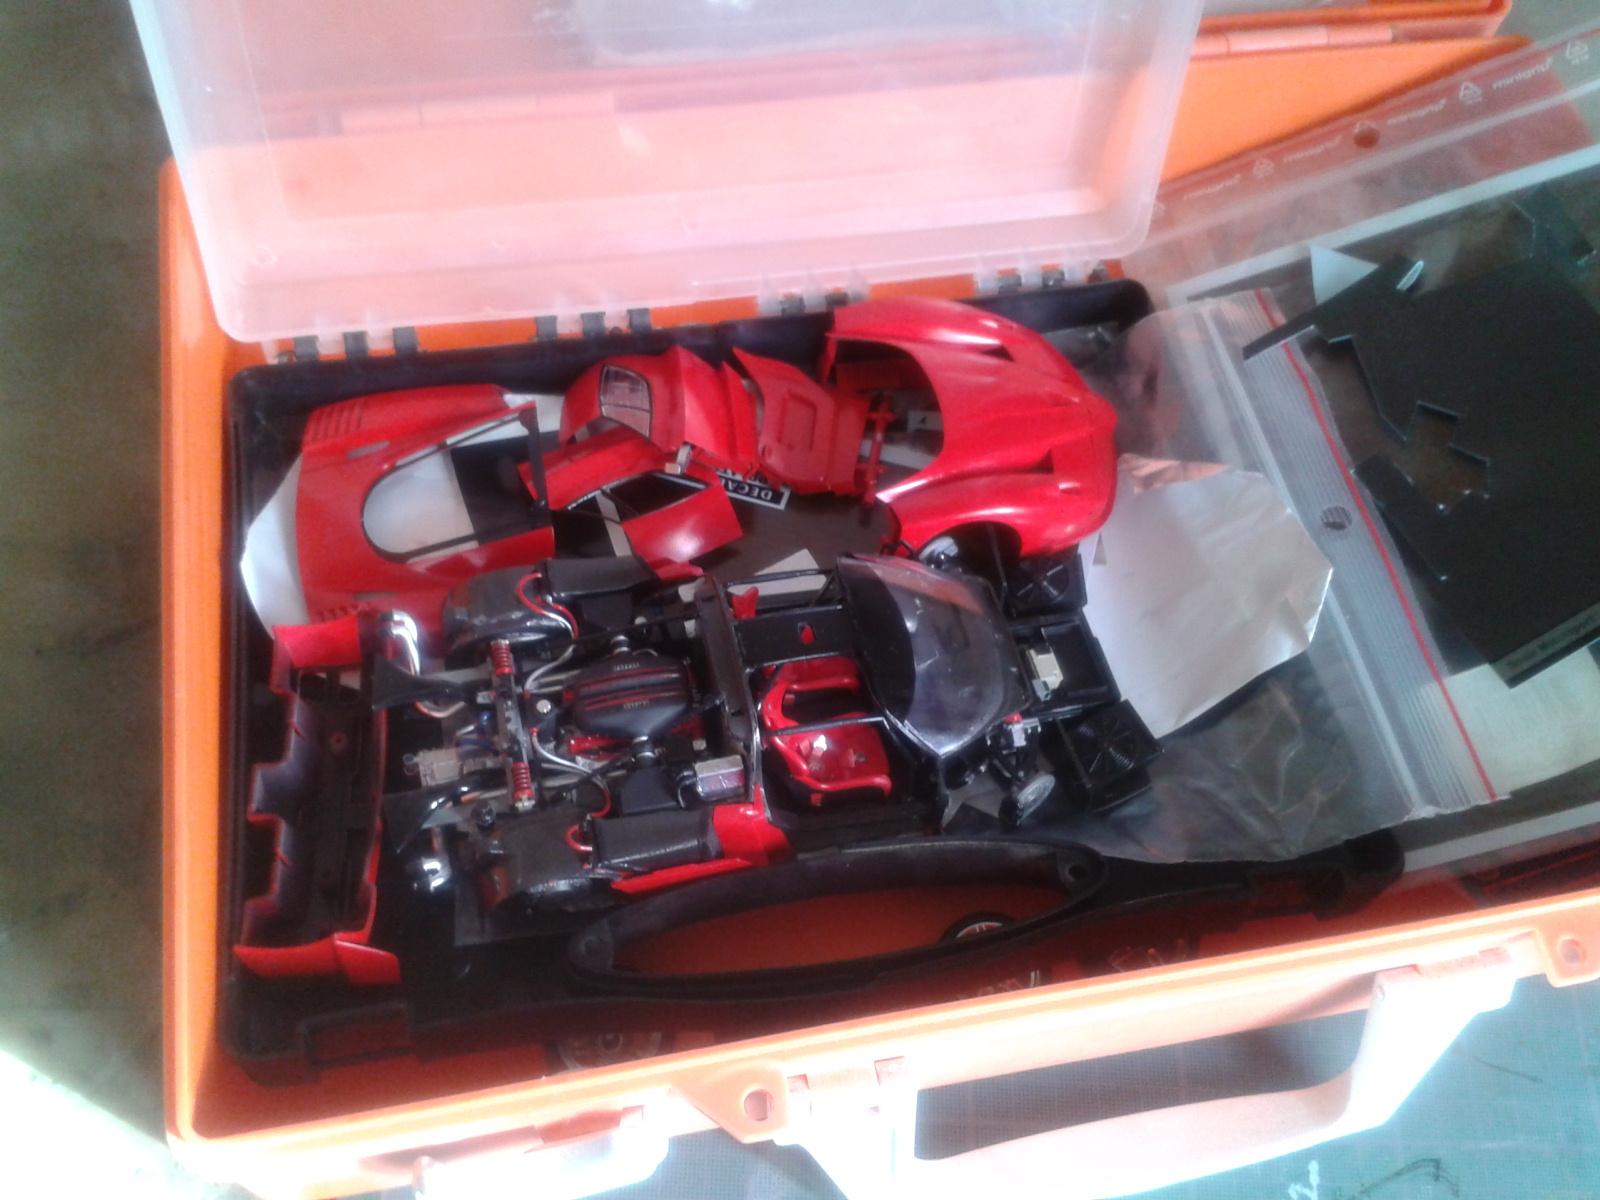 Ferrari FXX ...Tamiya 1/24... Reprise du montage !!!!!! 20130403175356